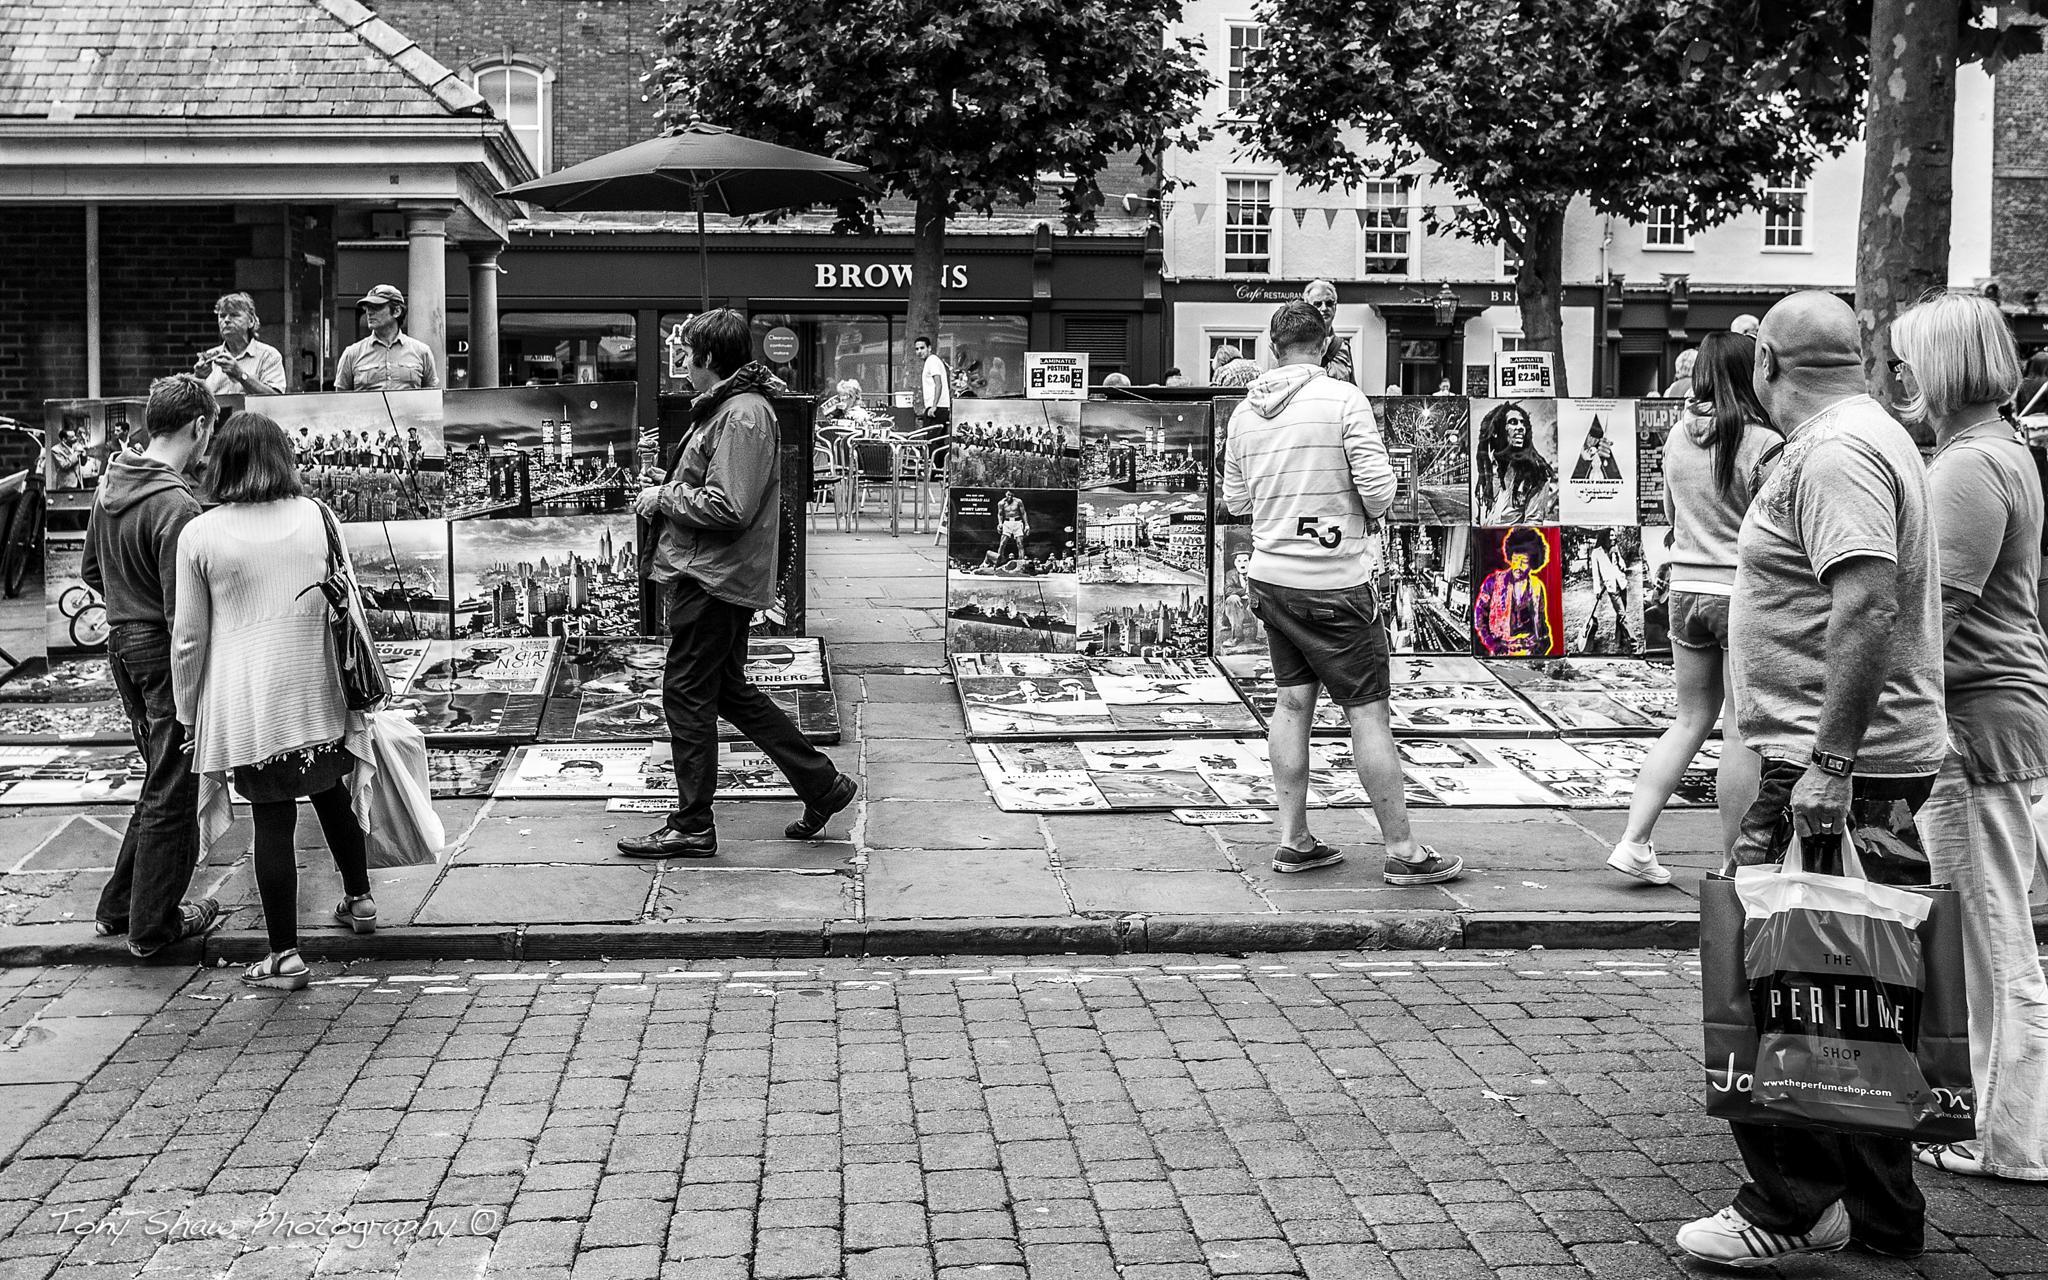 Street traders by Tony Shaw